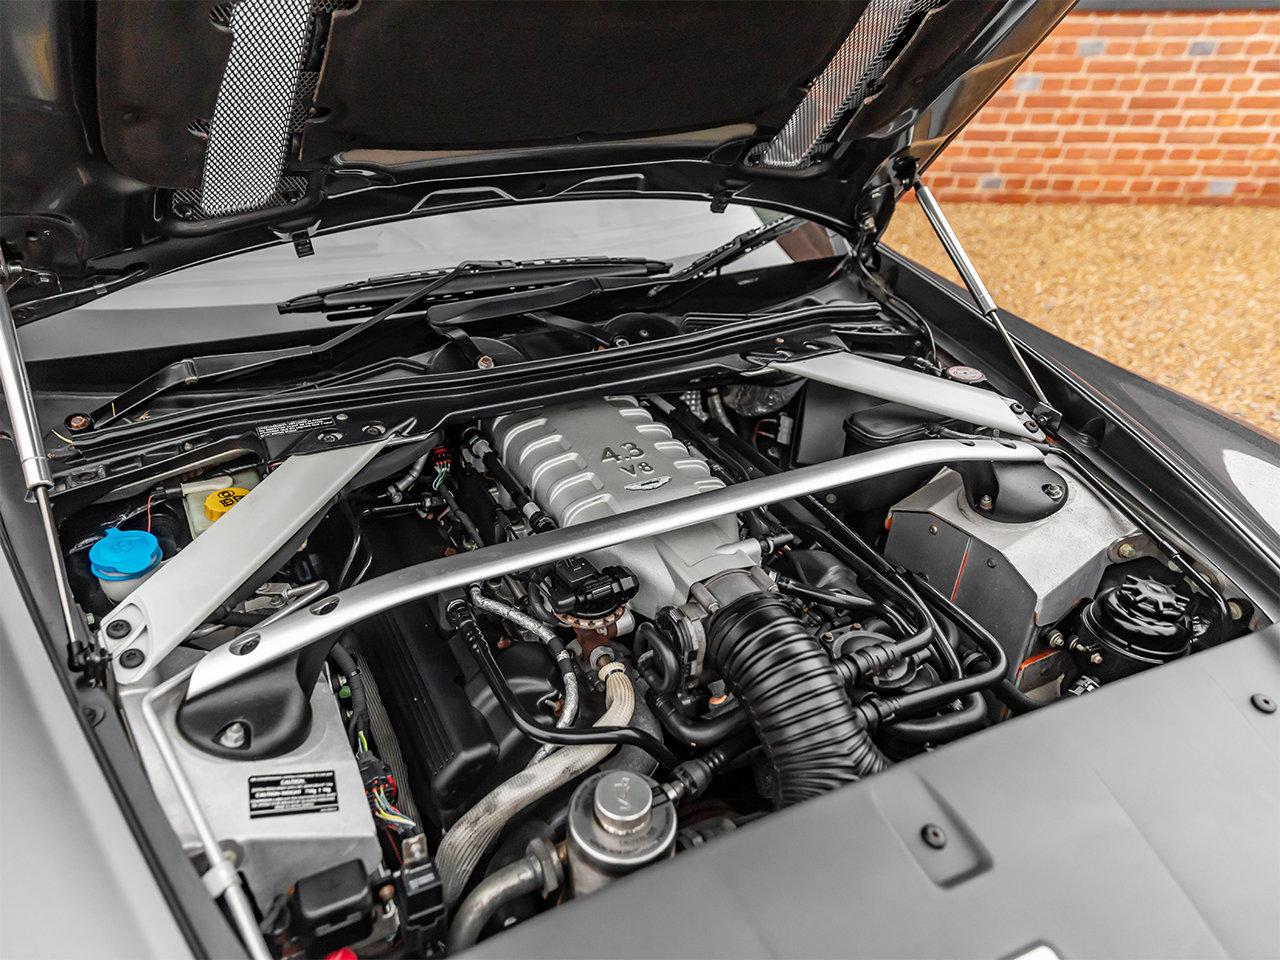 2006 Aston Martin V8 Vantage - Prodrive  For Sale (picture 5 of 6)